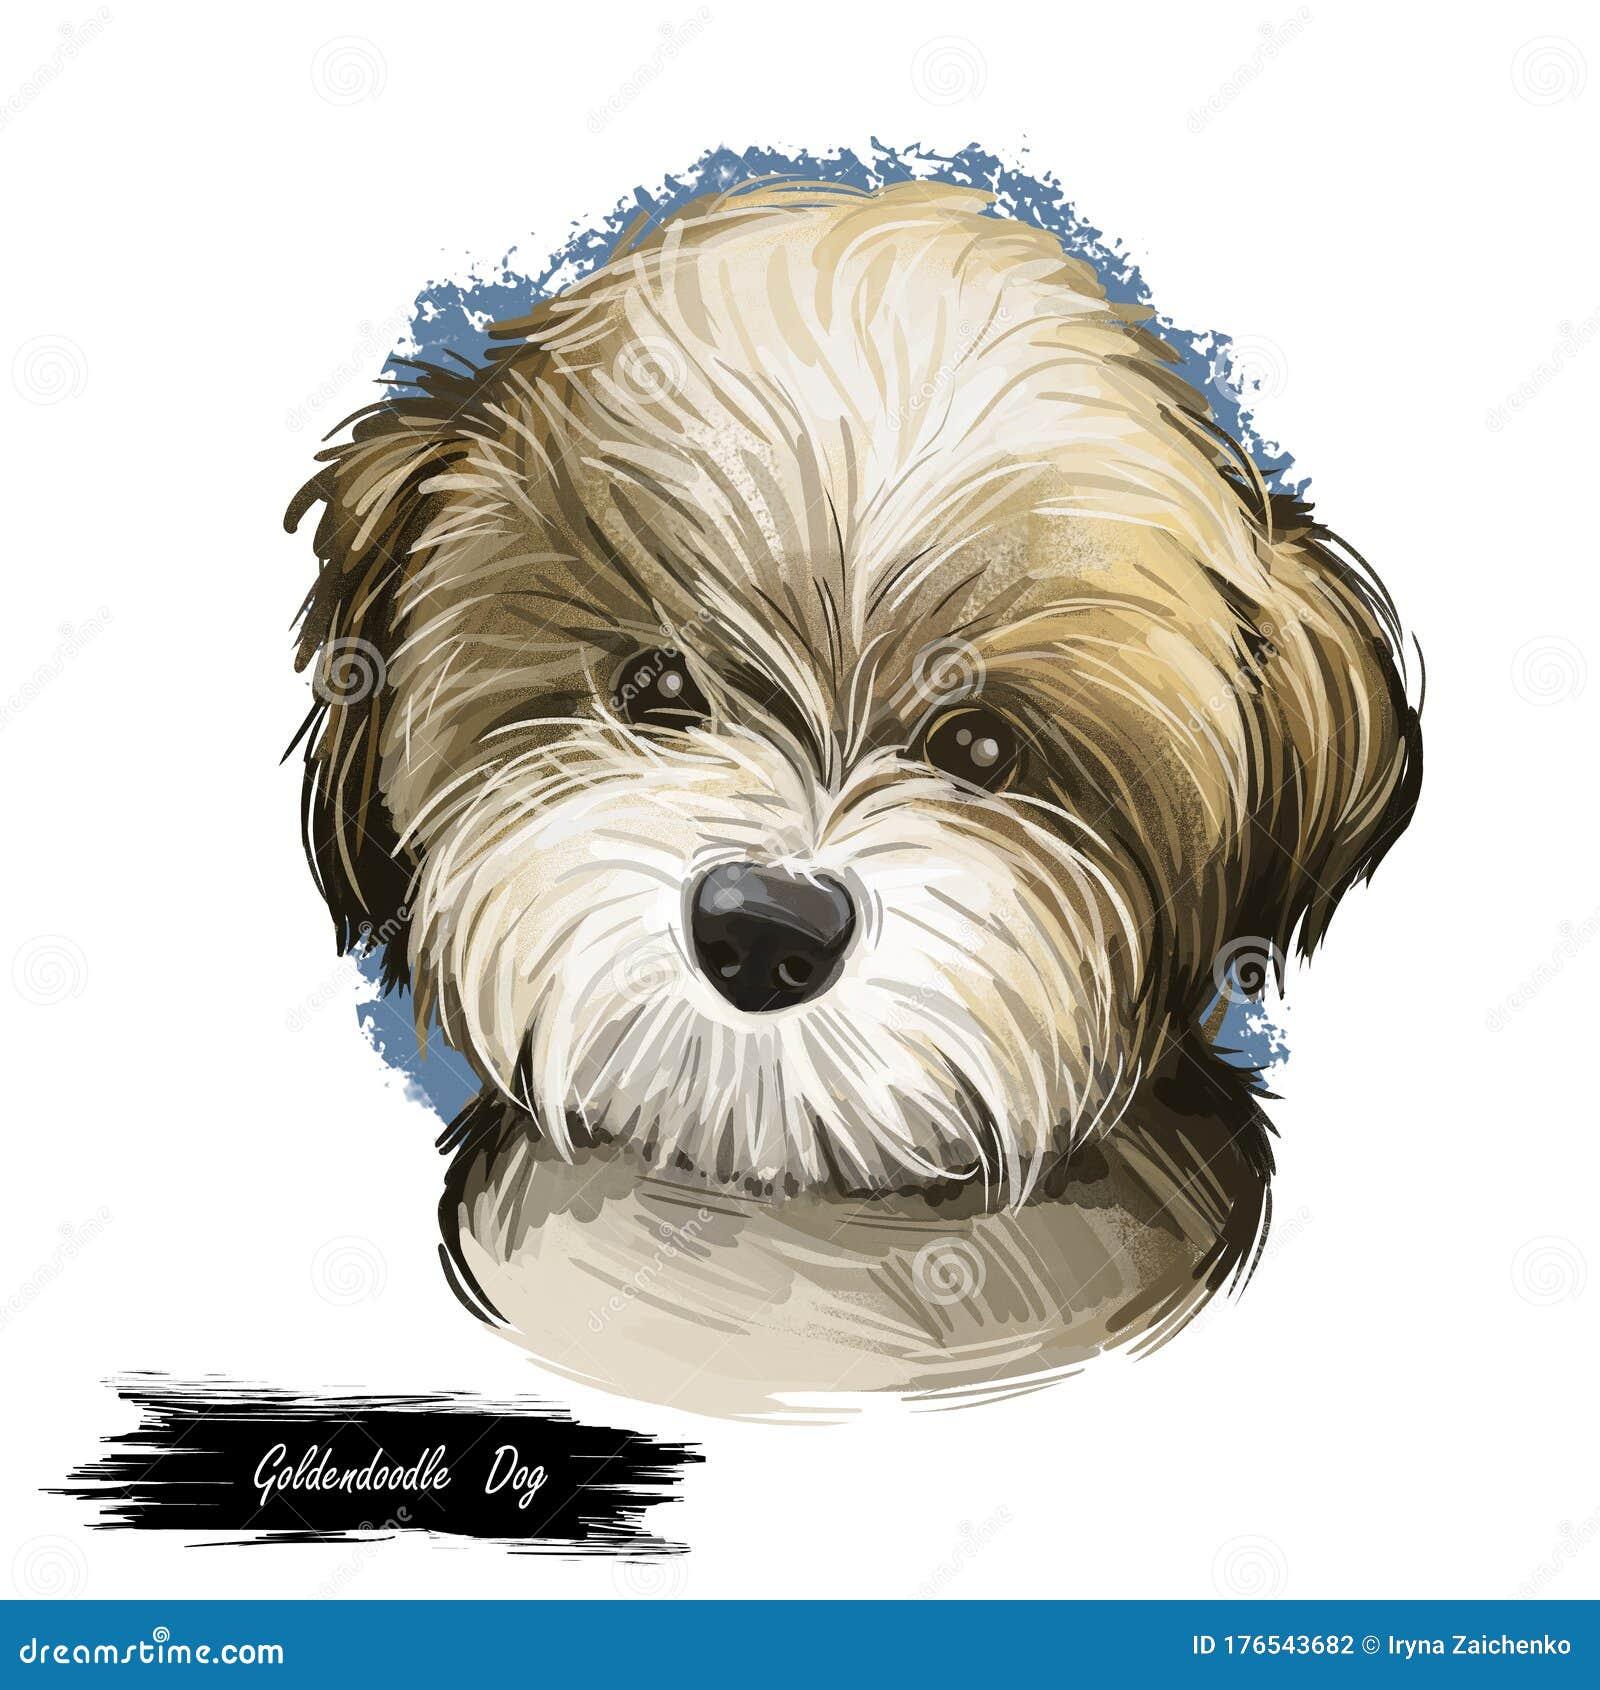 Goldendoodle Dog Stock Illustrations 61 Goldendoodle Dog Stock Illustrations Vectors Clipart Dreamstime